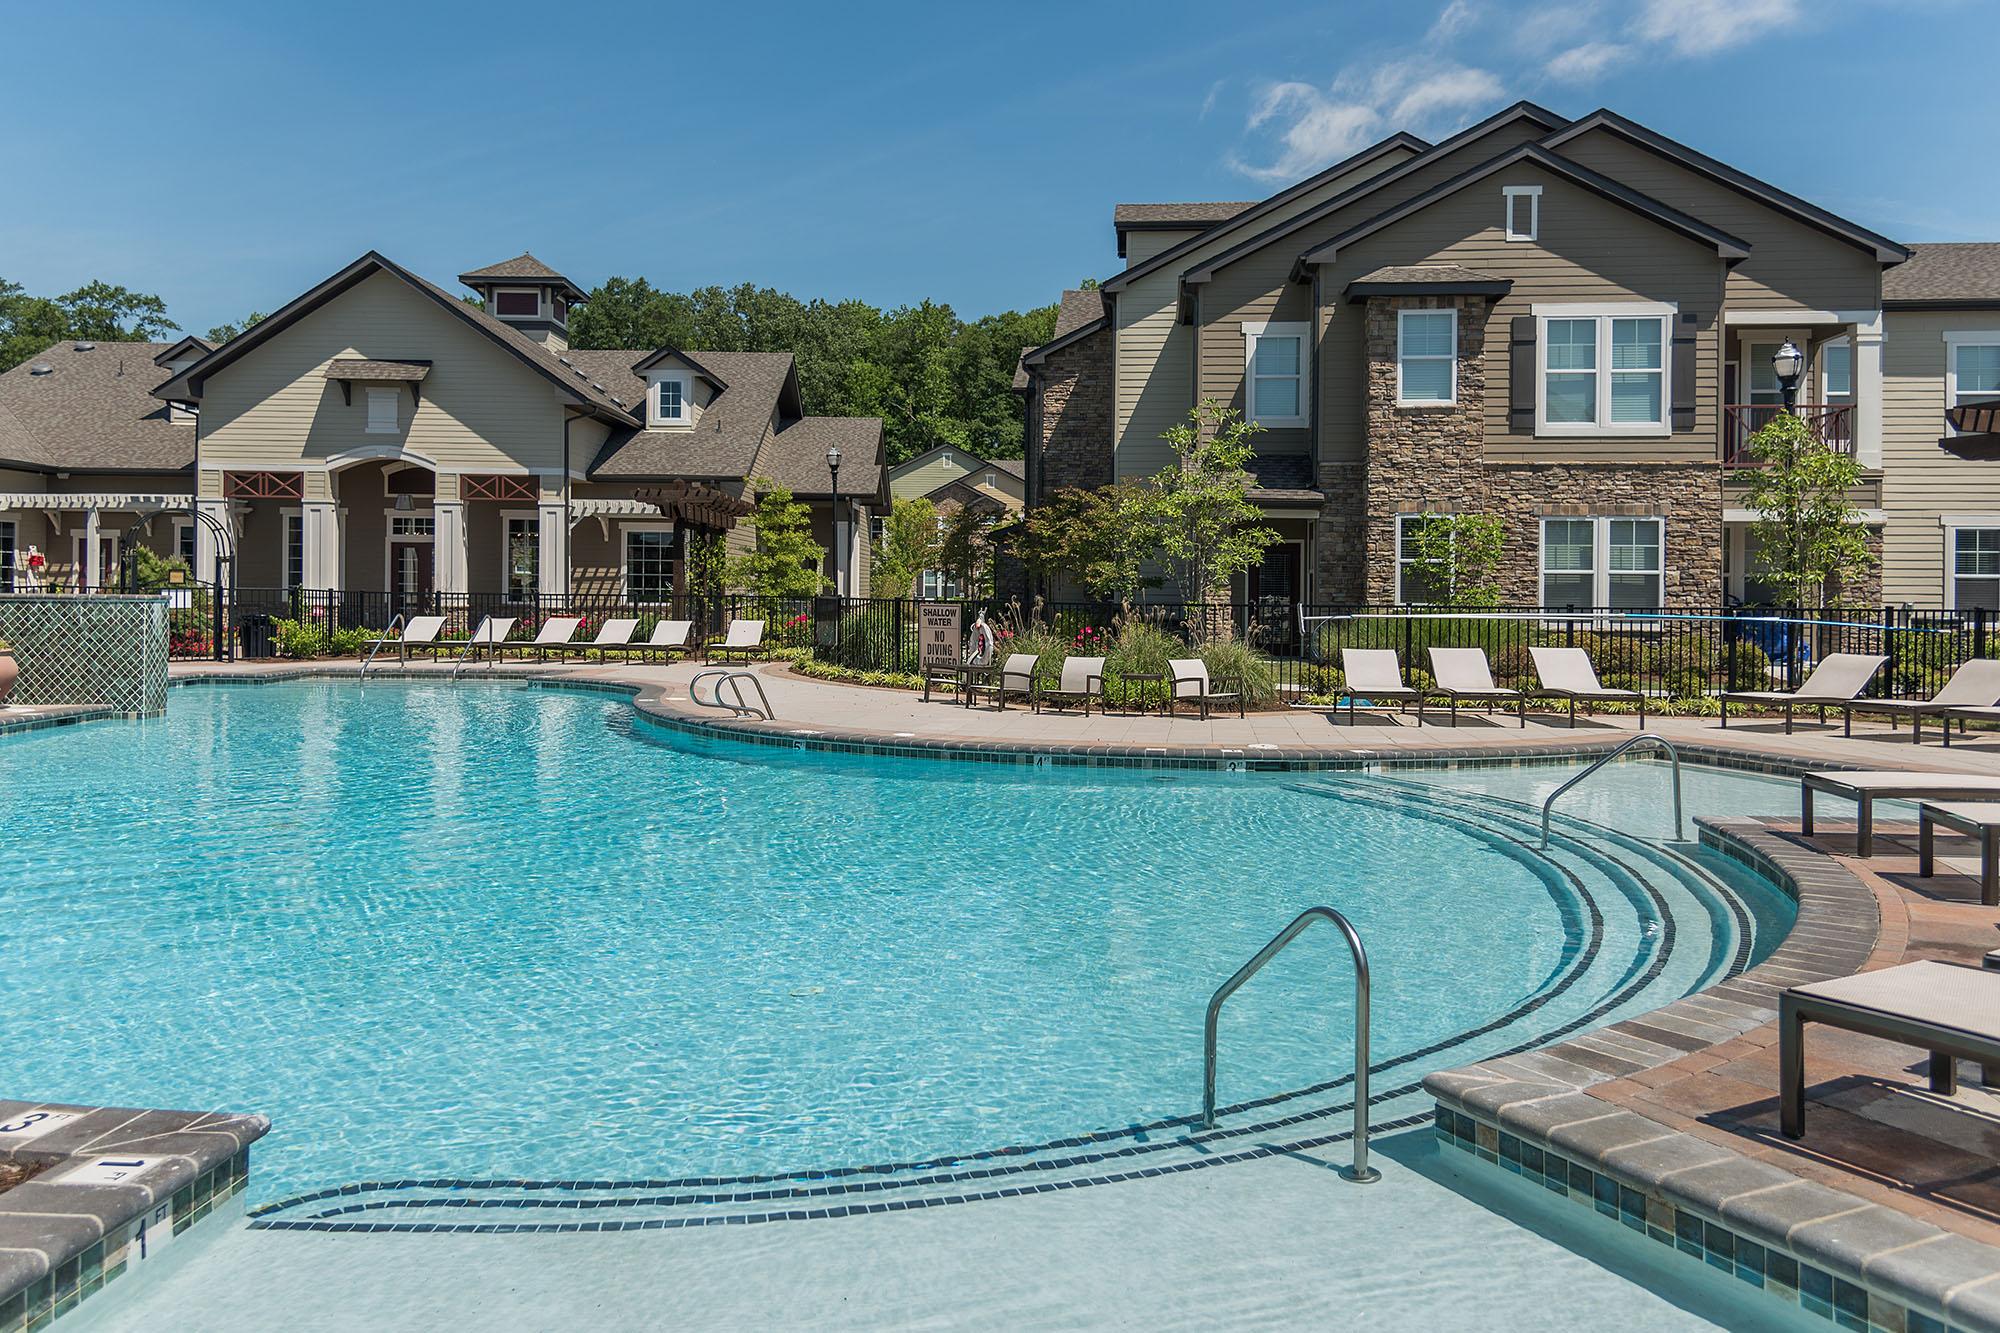 Tattersall arlington properties inc - 2 bedroom suites in chesapeake va ...